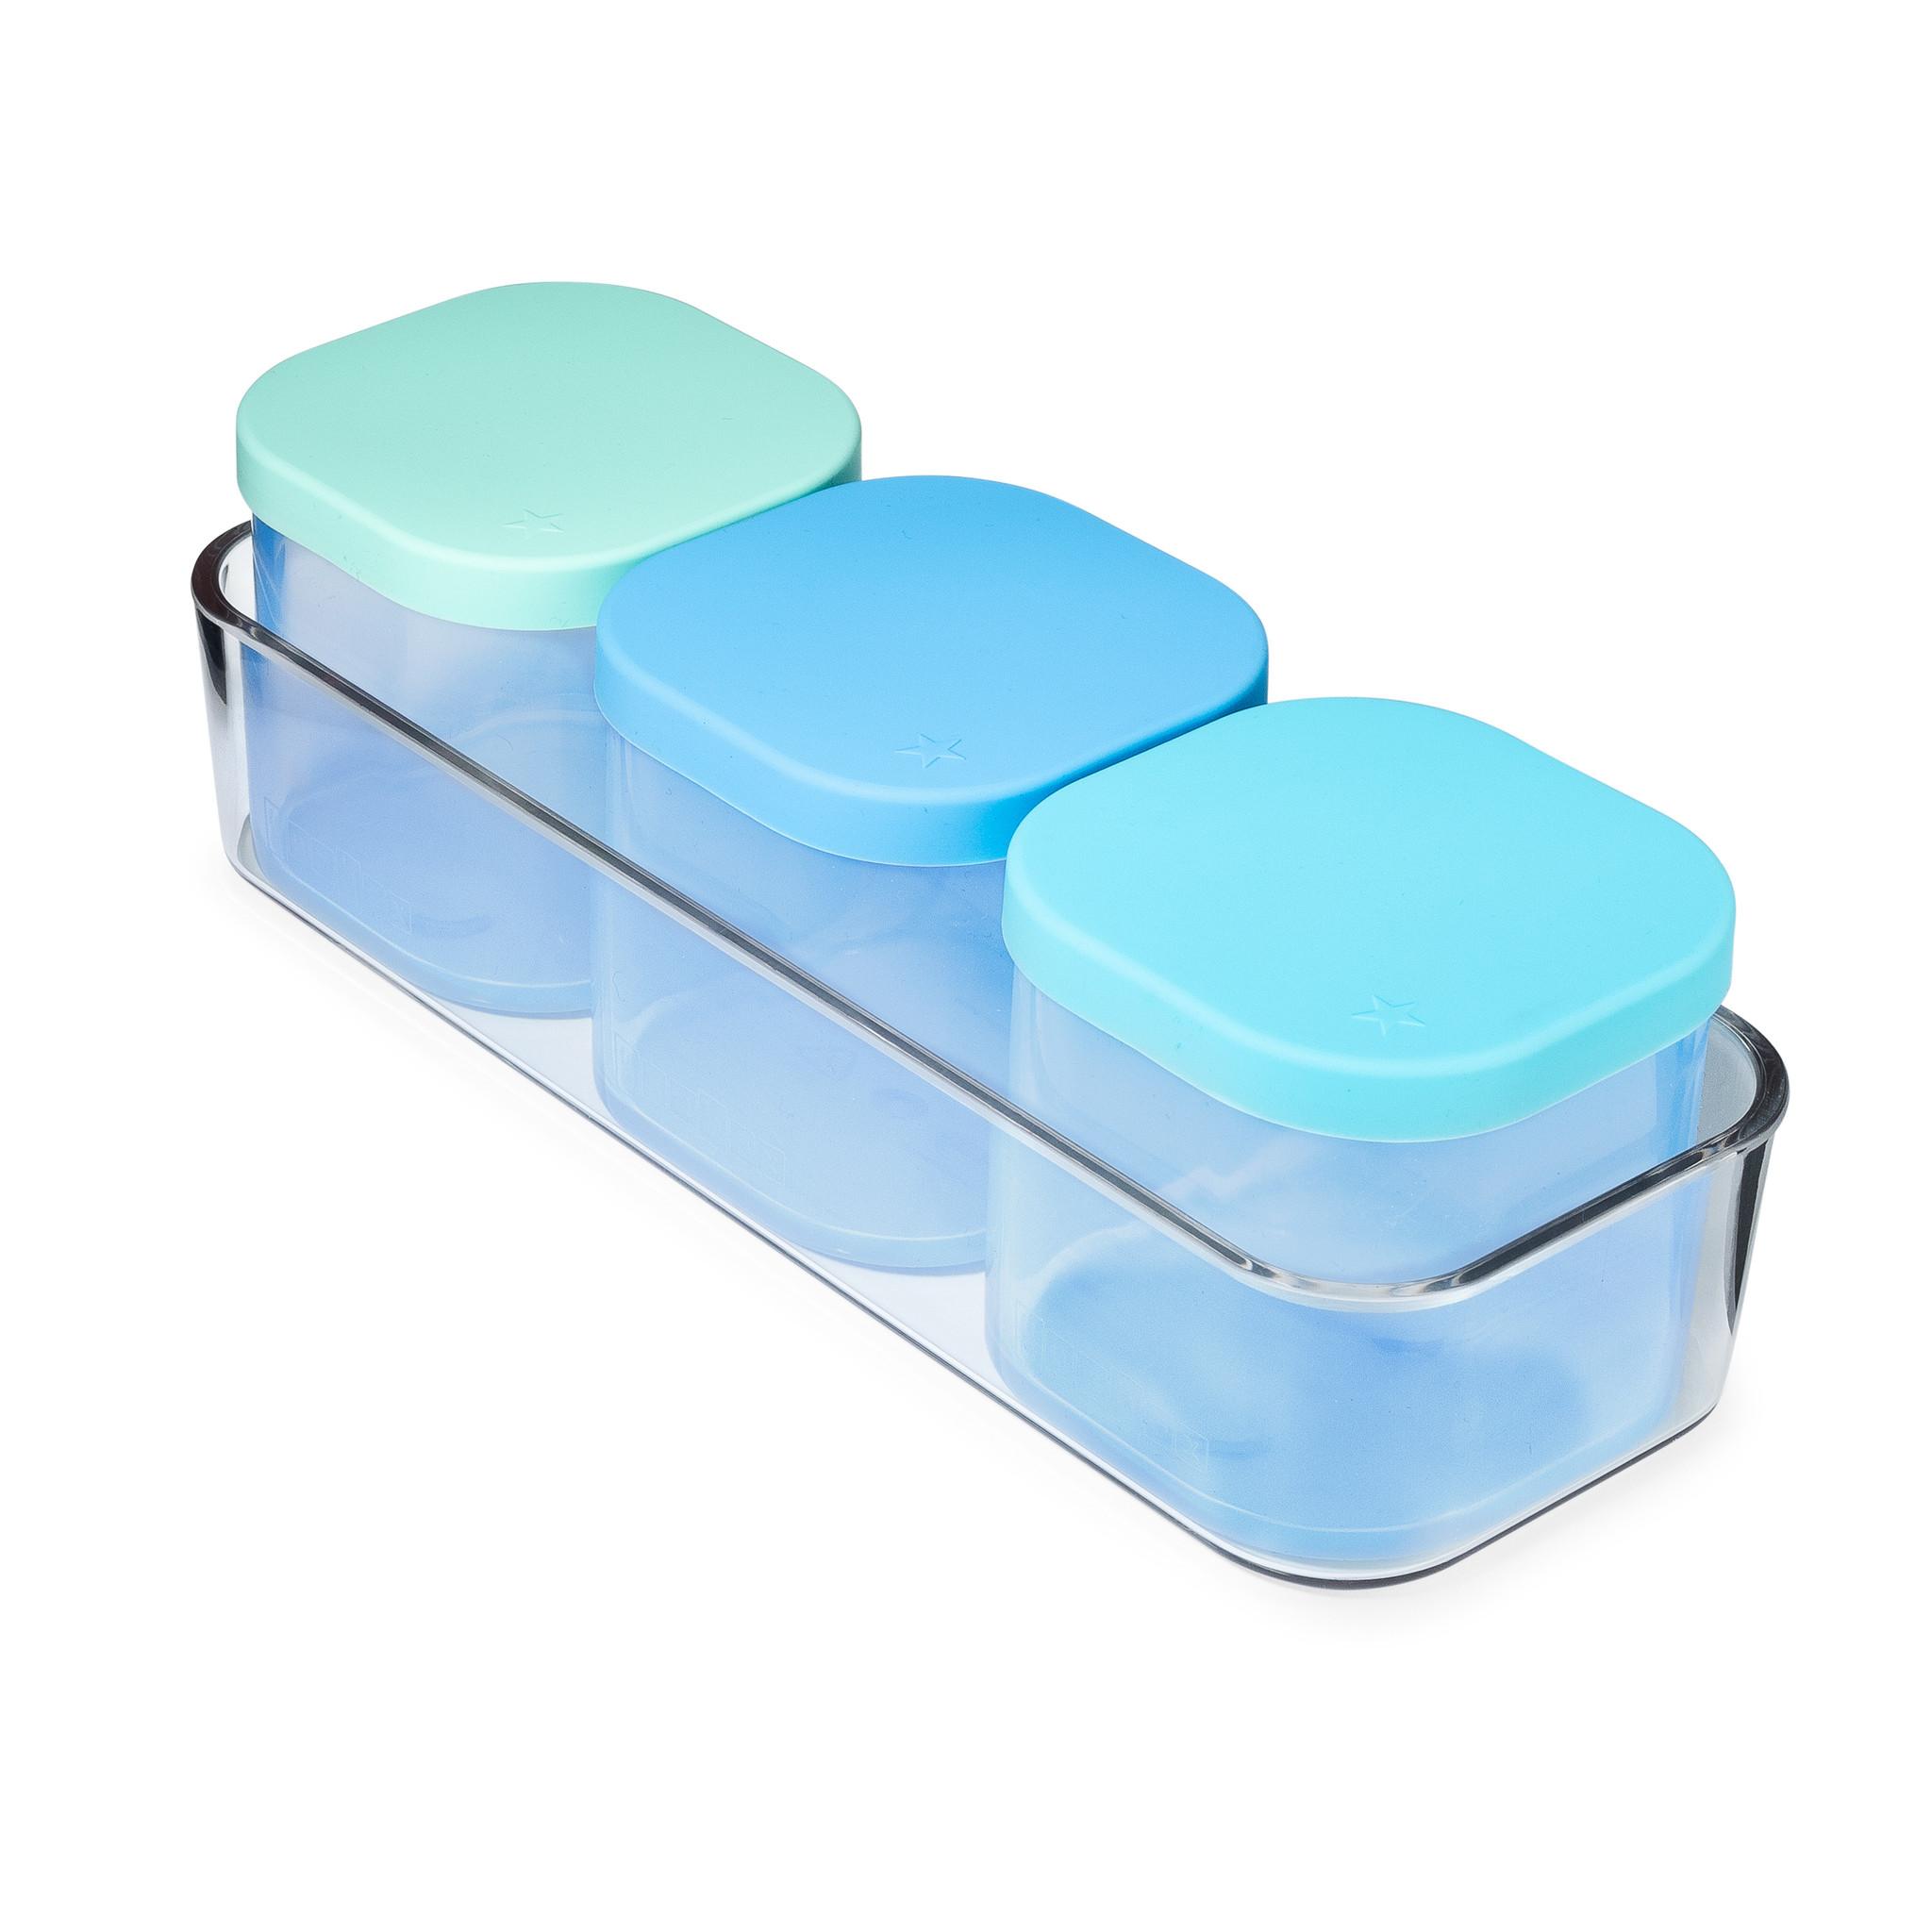 Yumbox Chop Chop tray, rectangular-12